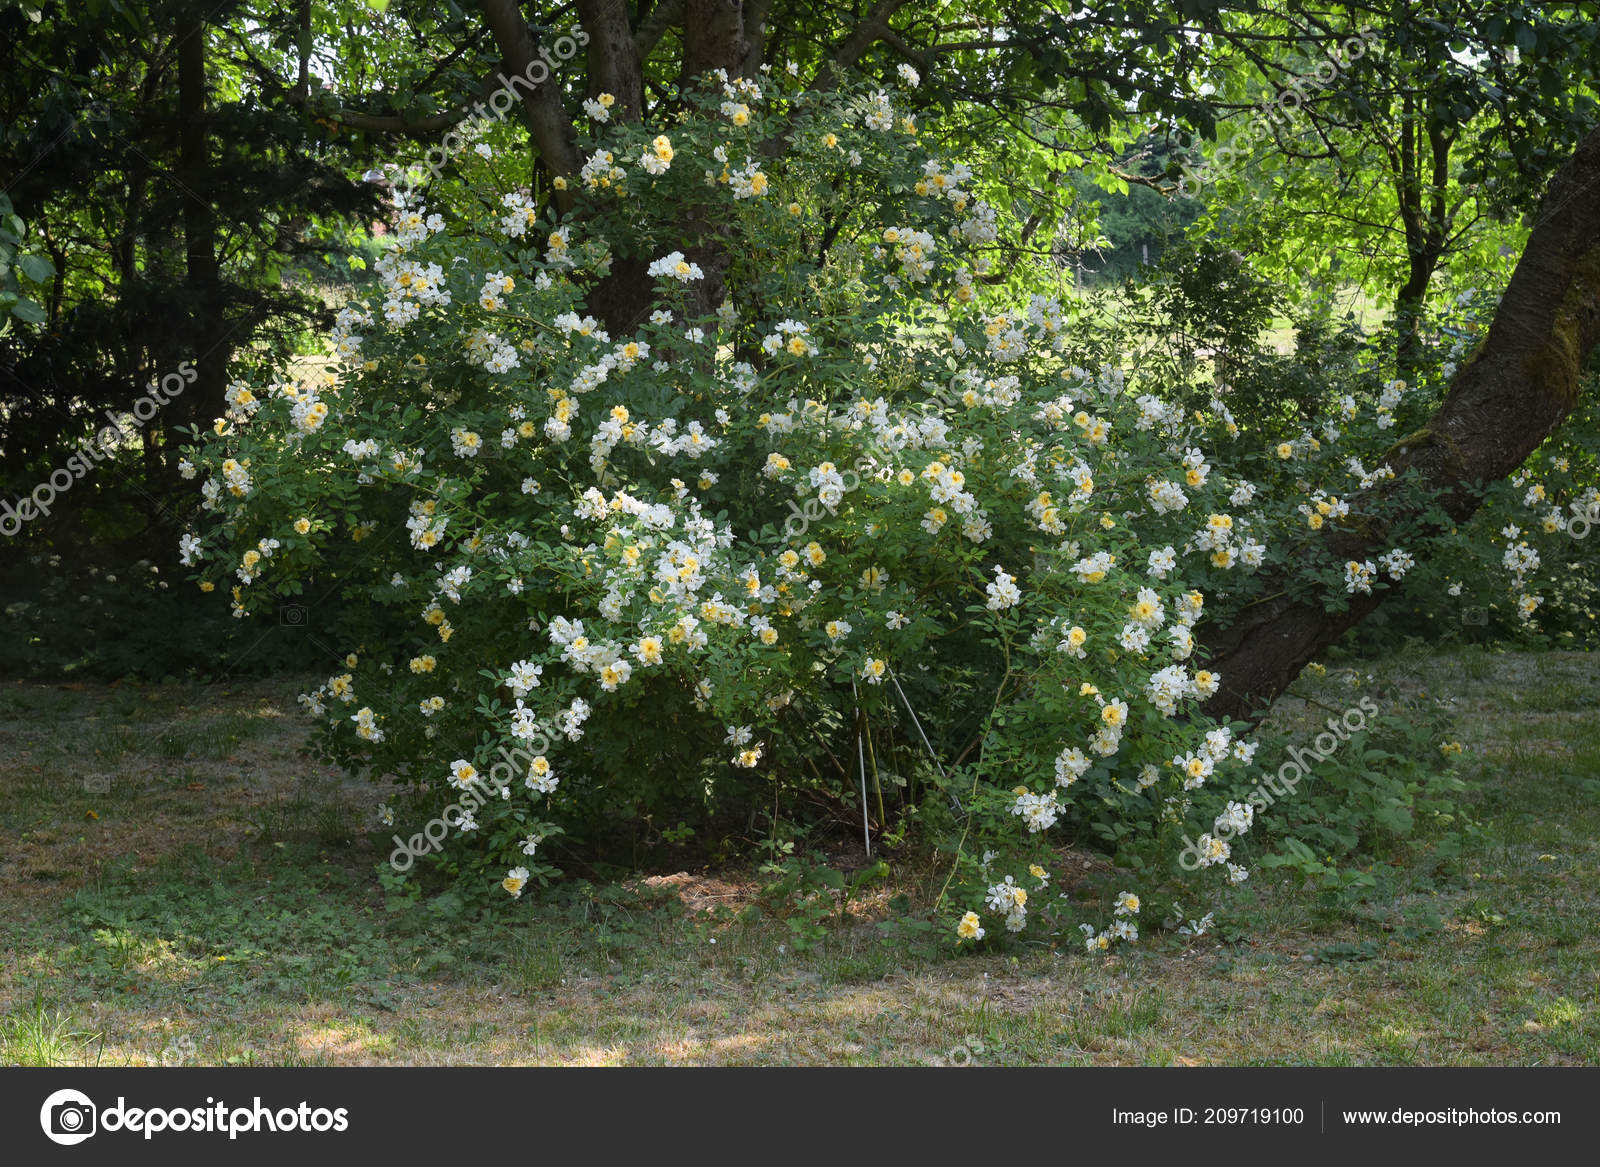 Rosa Arbusto Christine Helene Con Pequenas Flores Amarillas Blancas